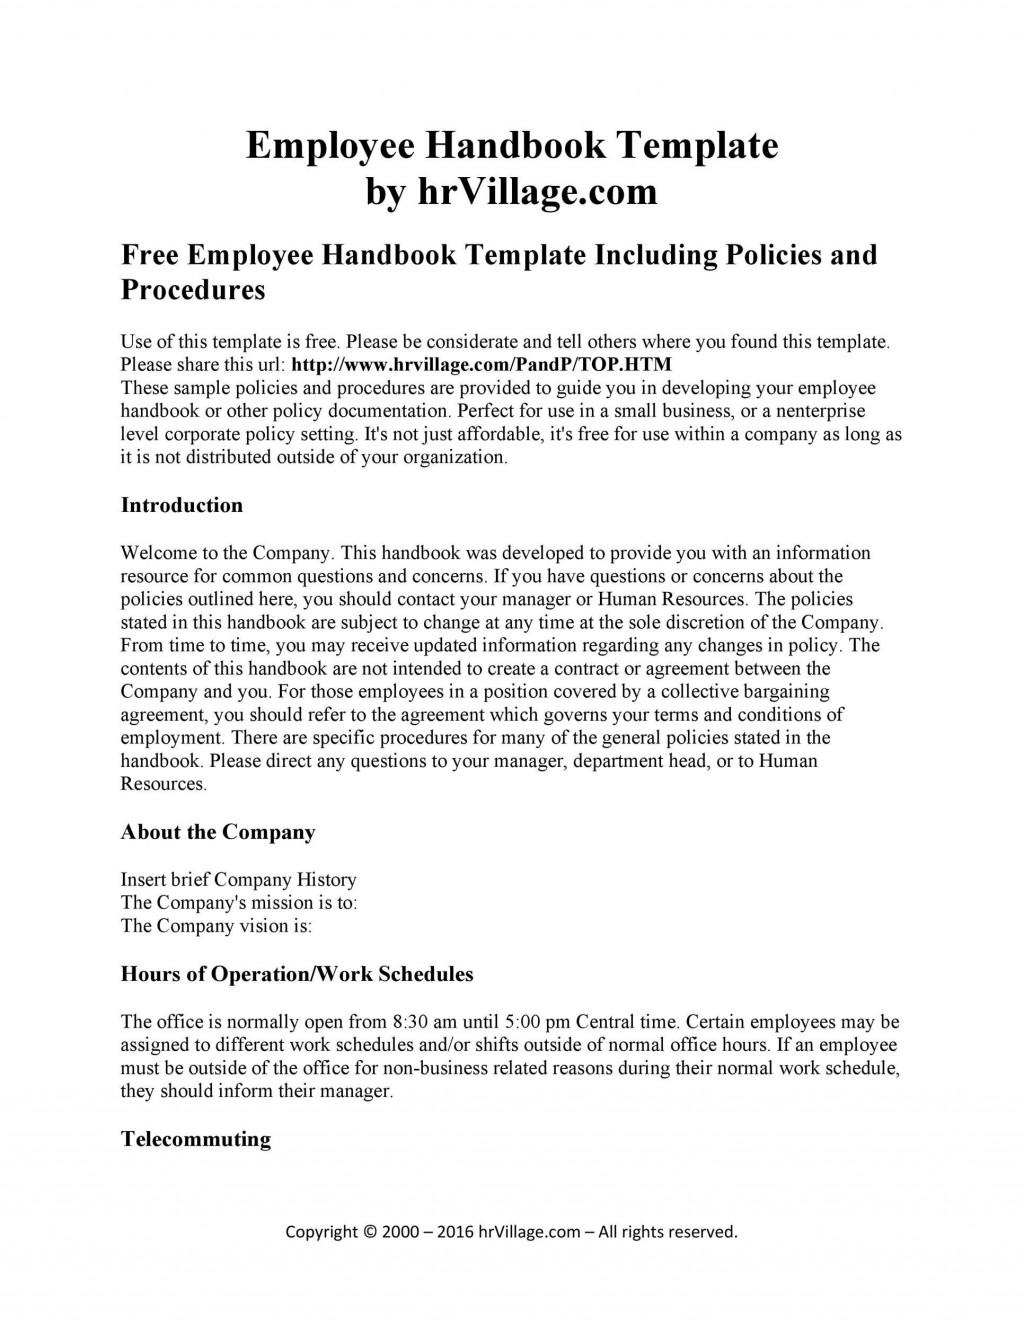 005 Shocking Free Employment Handbook Template Idea Large